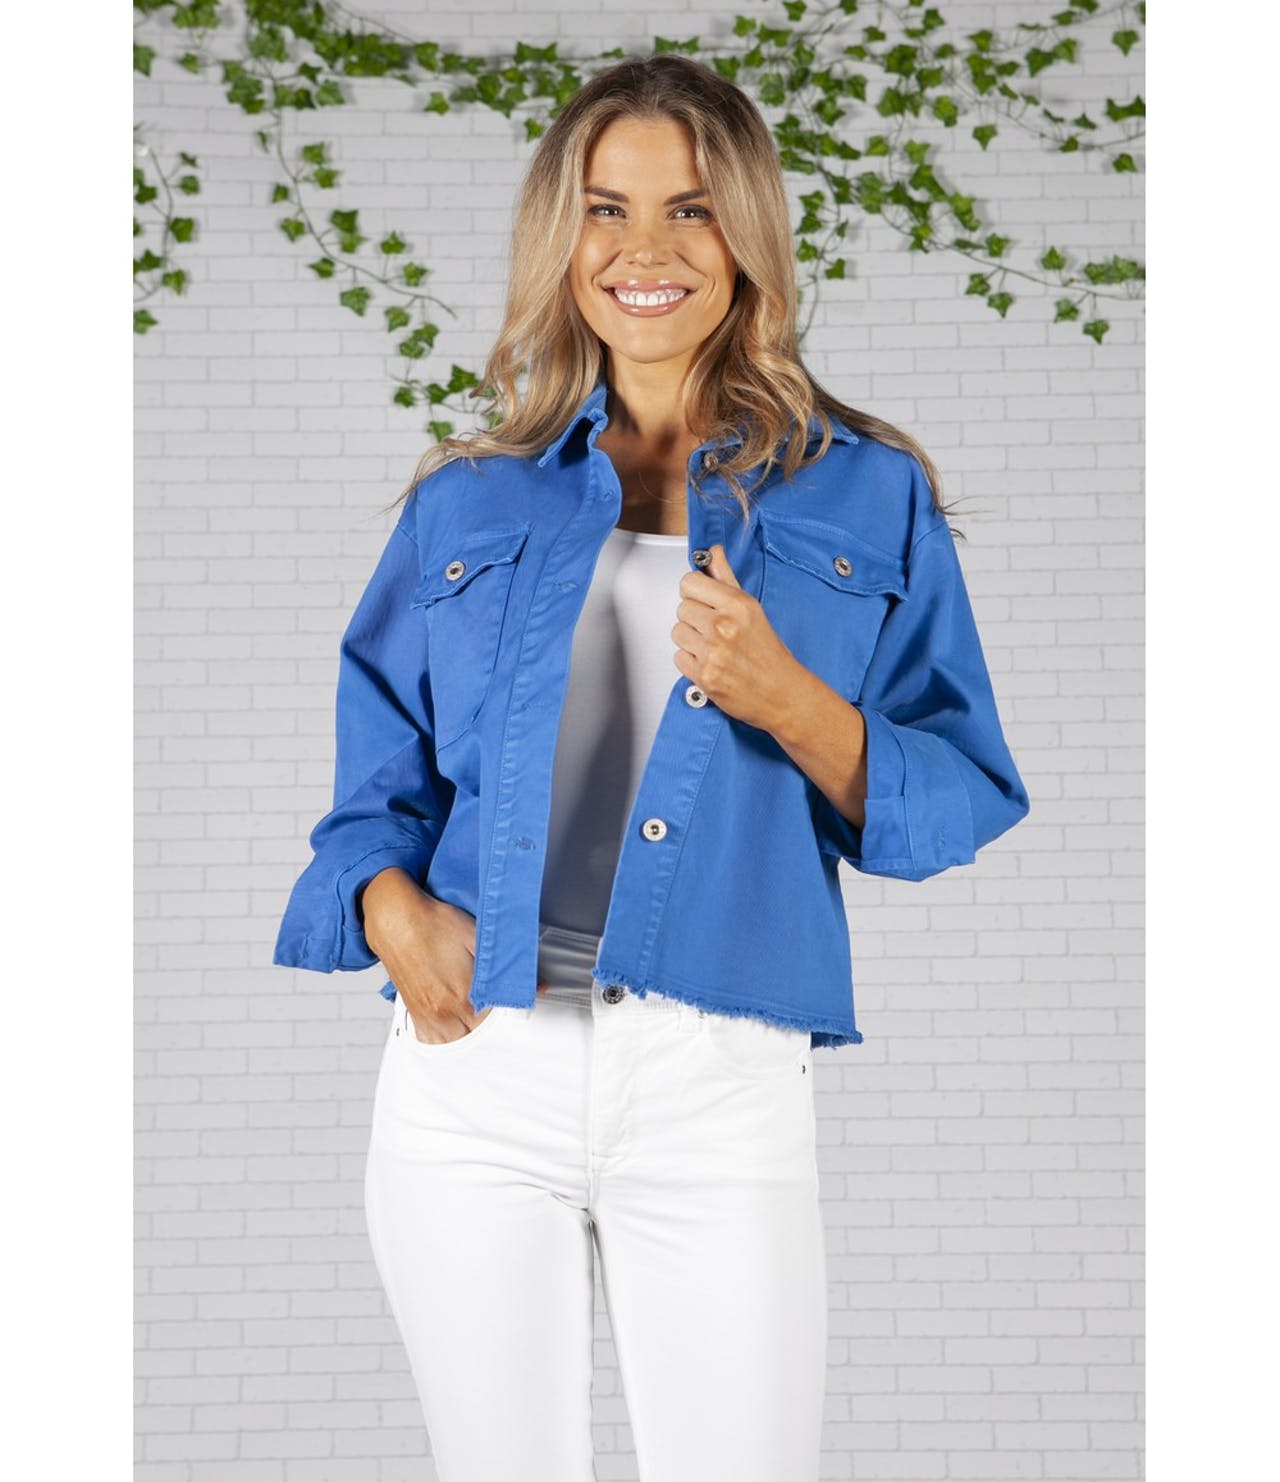 Zapara Cropped Royal Blue Denim Jacket